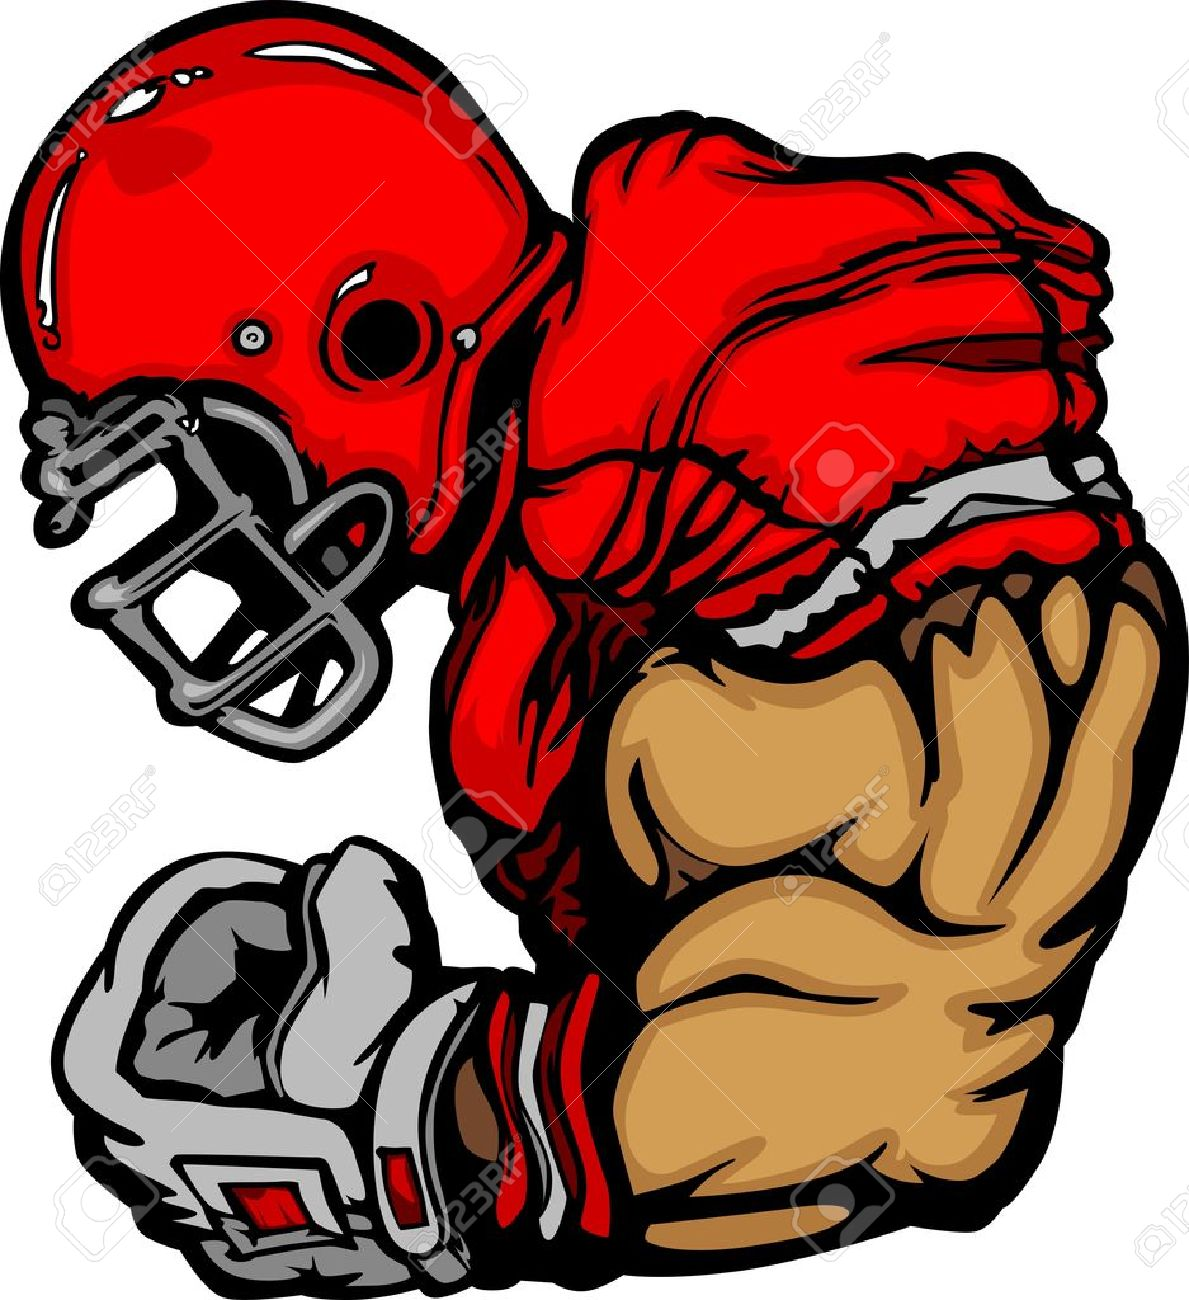 Football Player Lineman Cartoon Stock Vector - 10343513